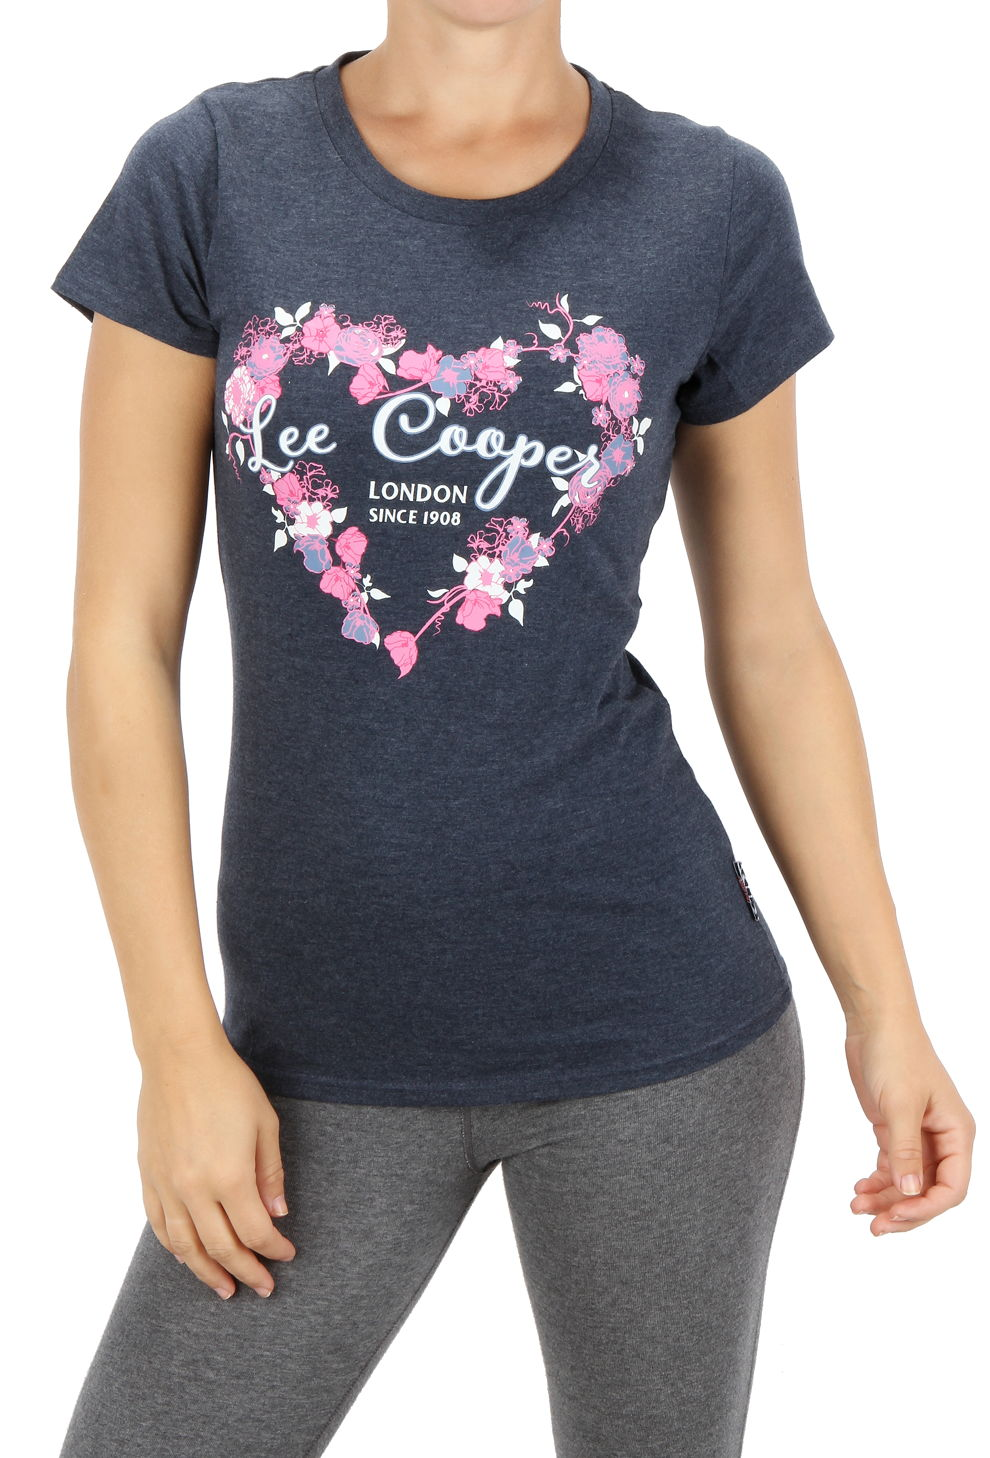 79ca85503 Dámske tričko Lee Cooper | hejmoda.sk